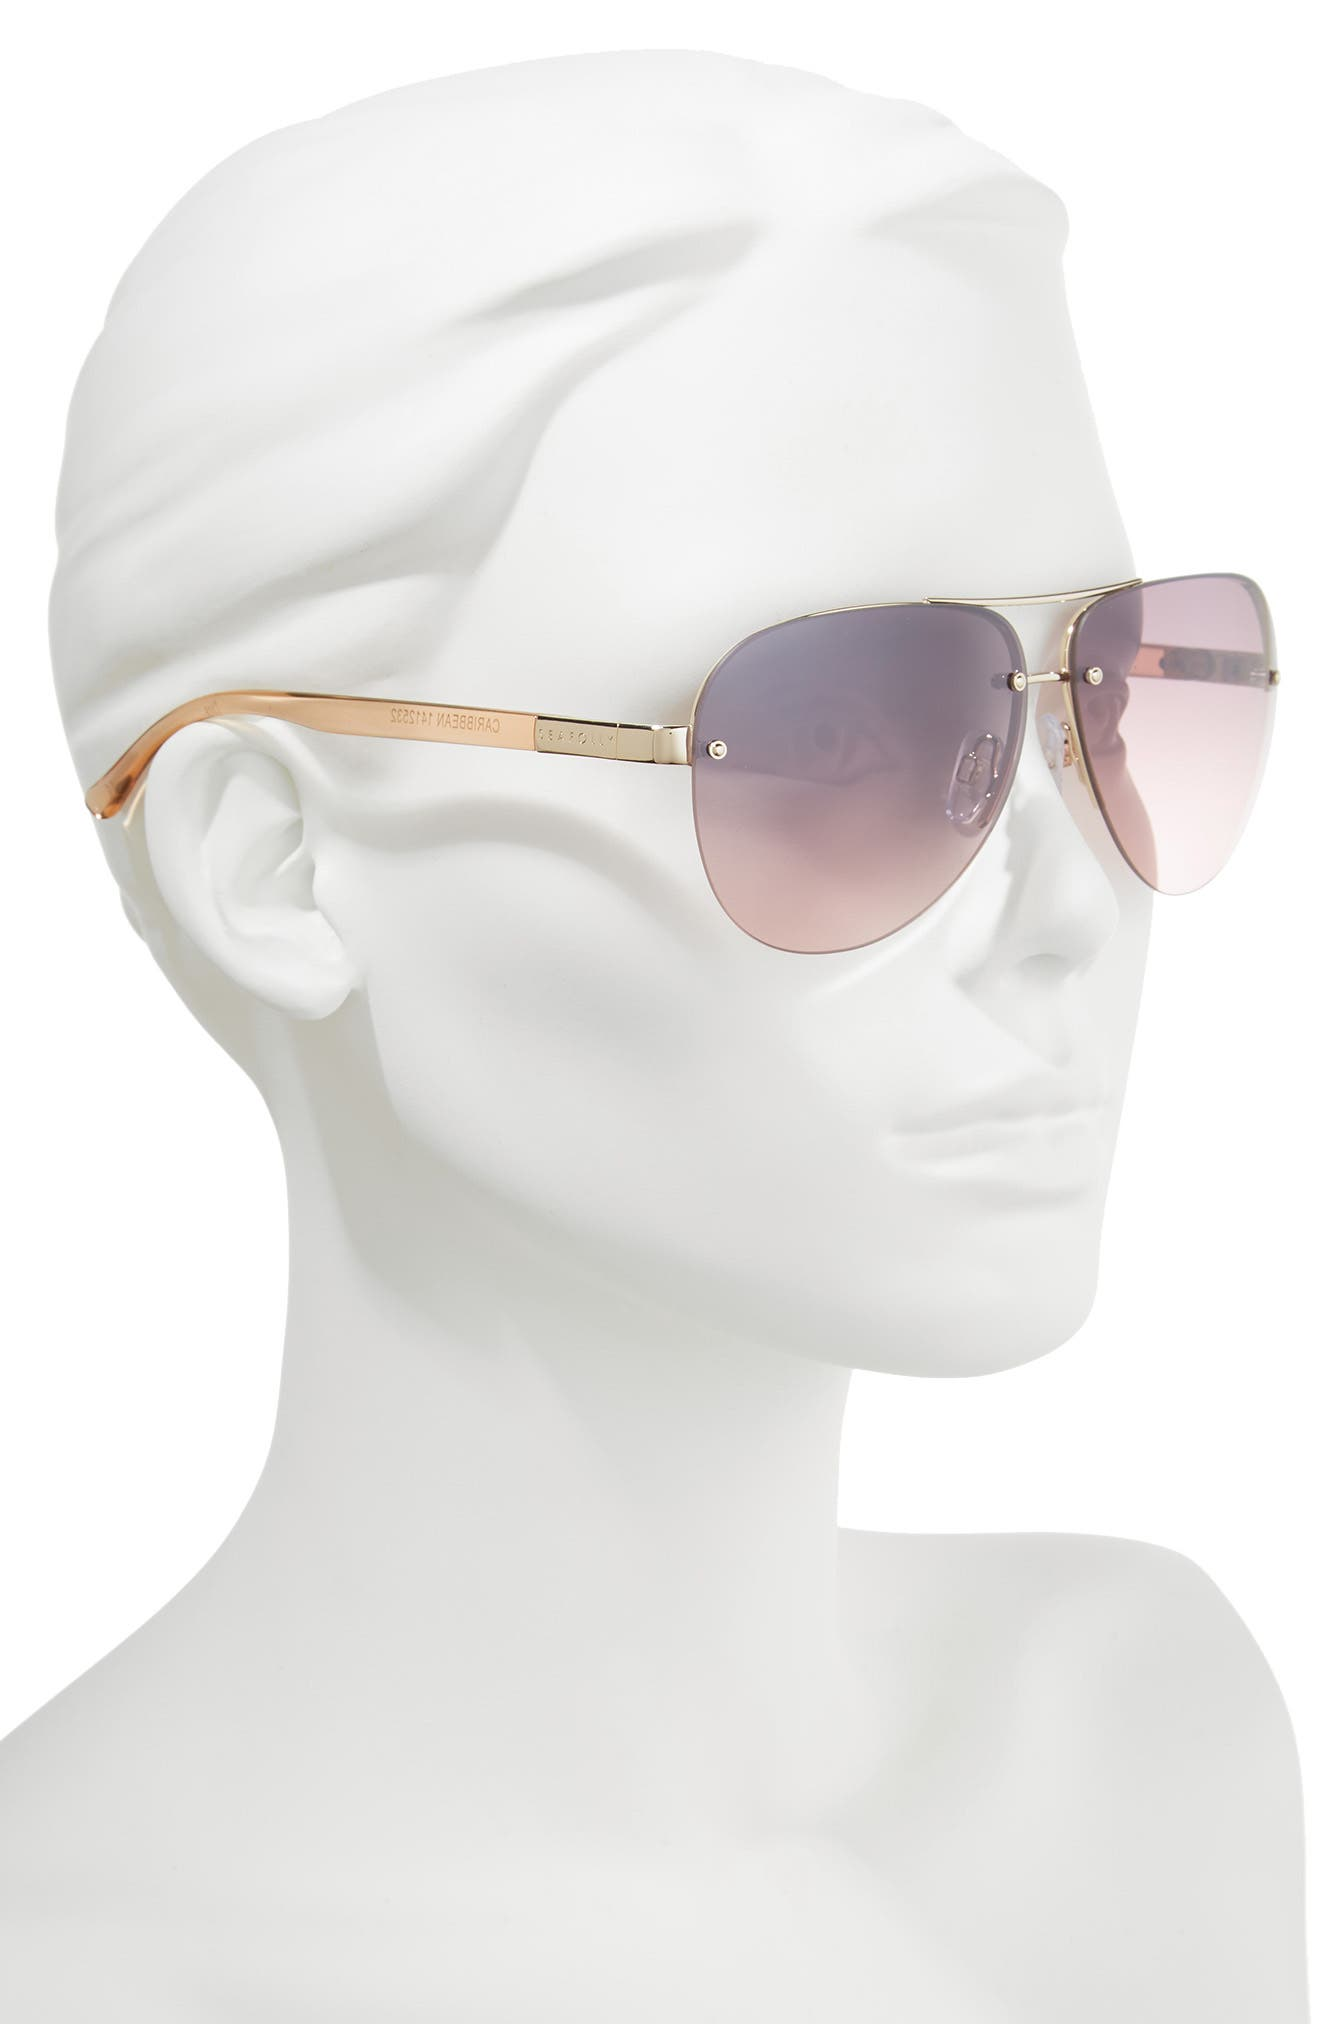 Caribbean 62mm Rimless Aviator Sunglasses,                             Alternate thumbnail 2, color,                             Gold